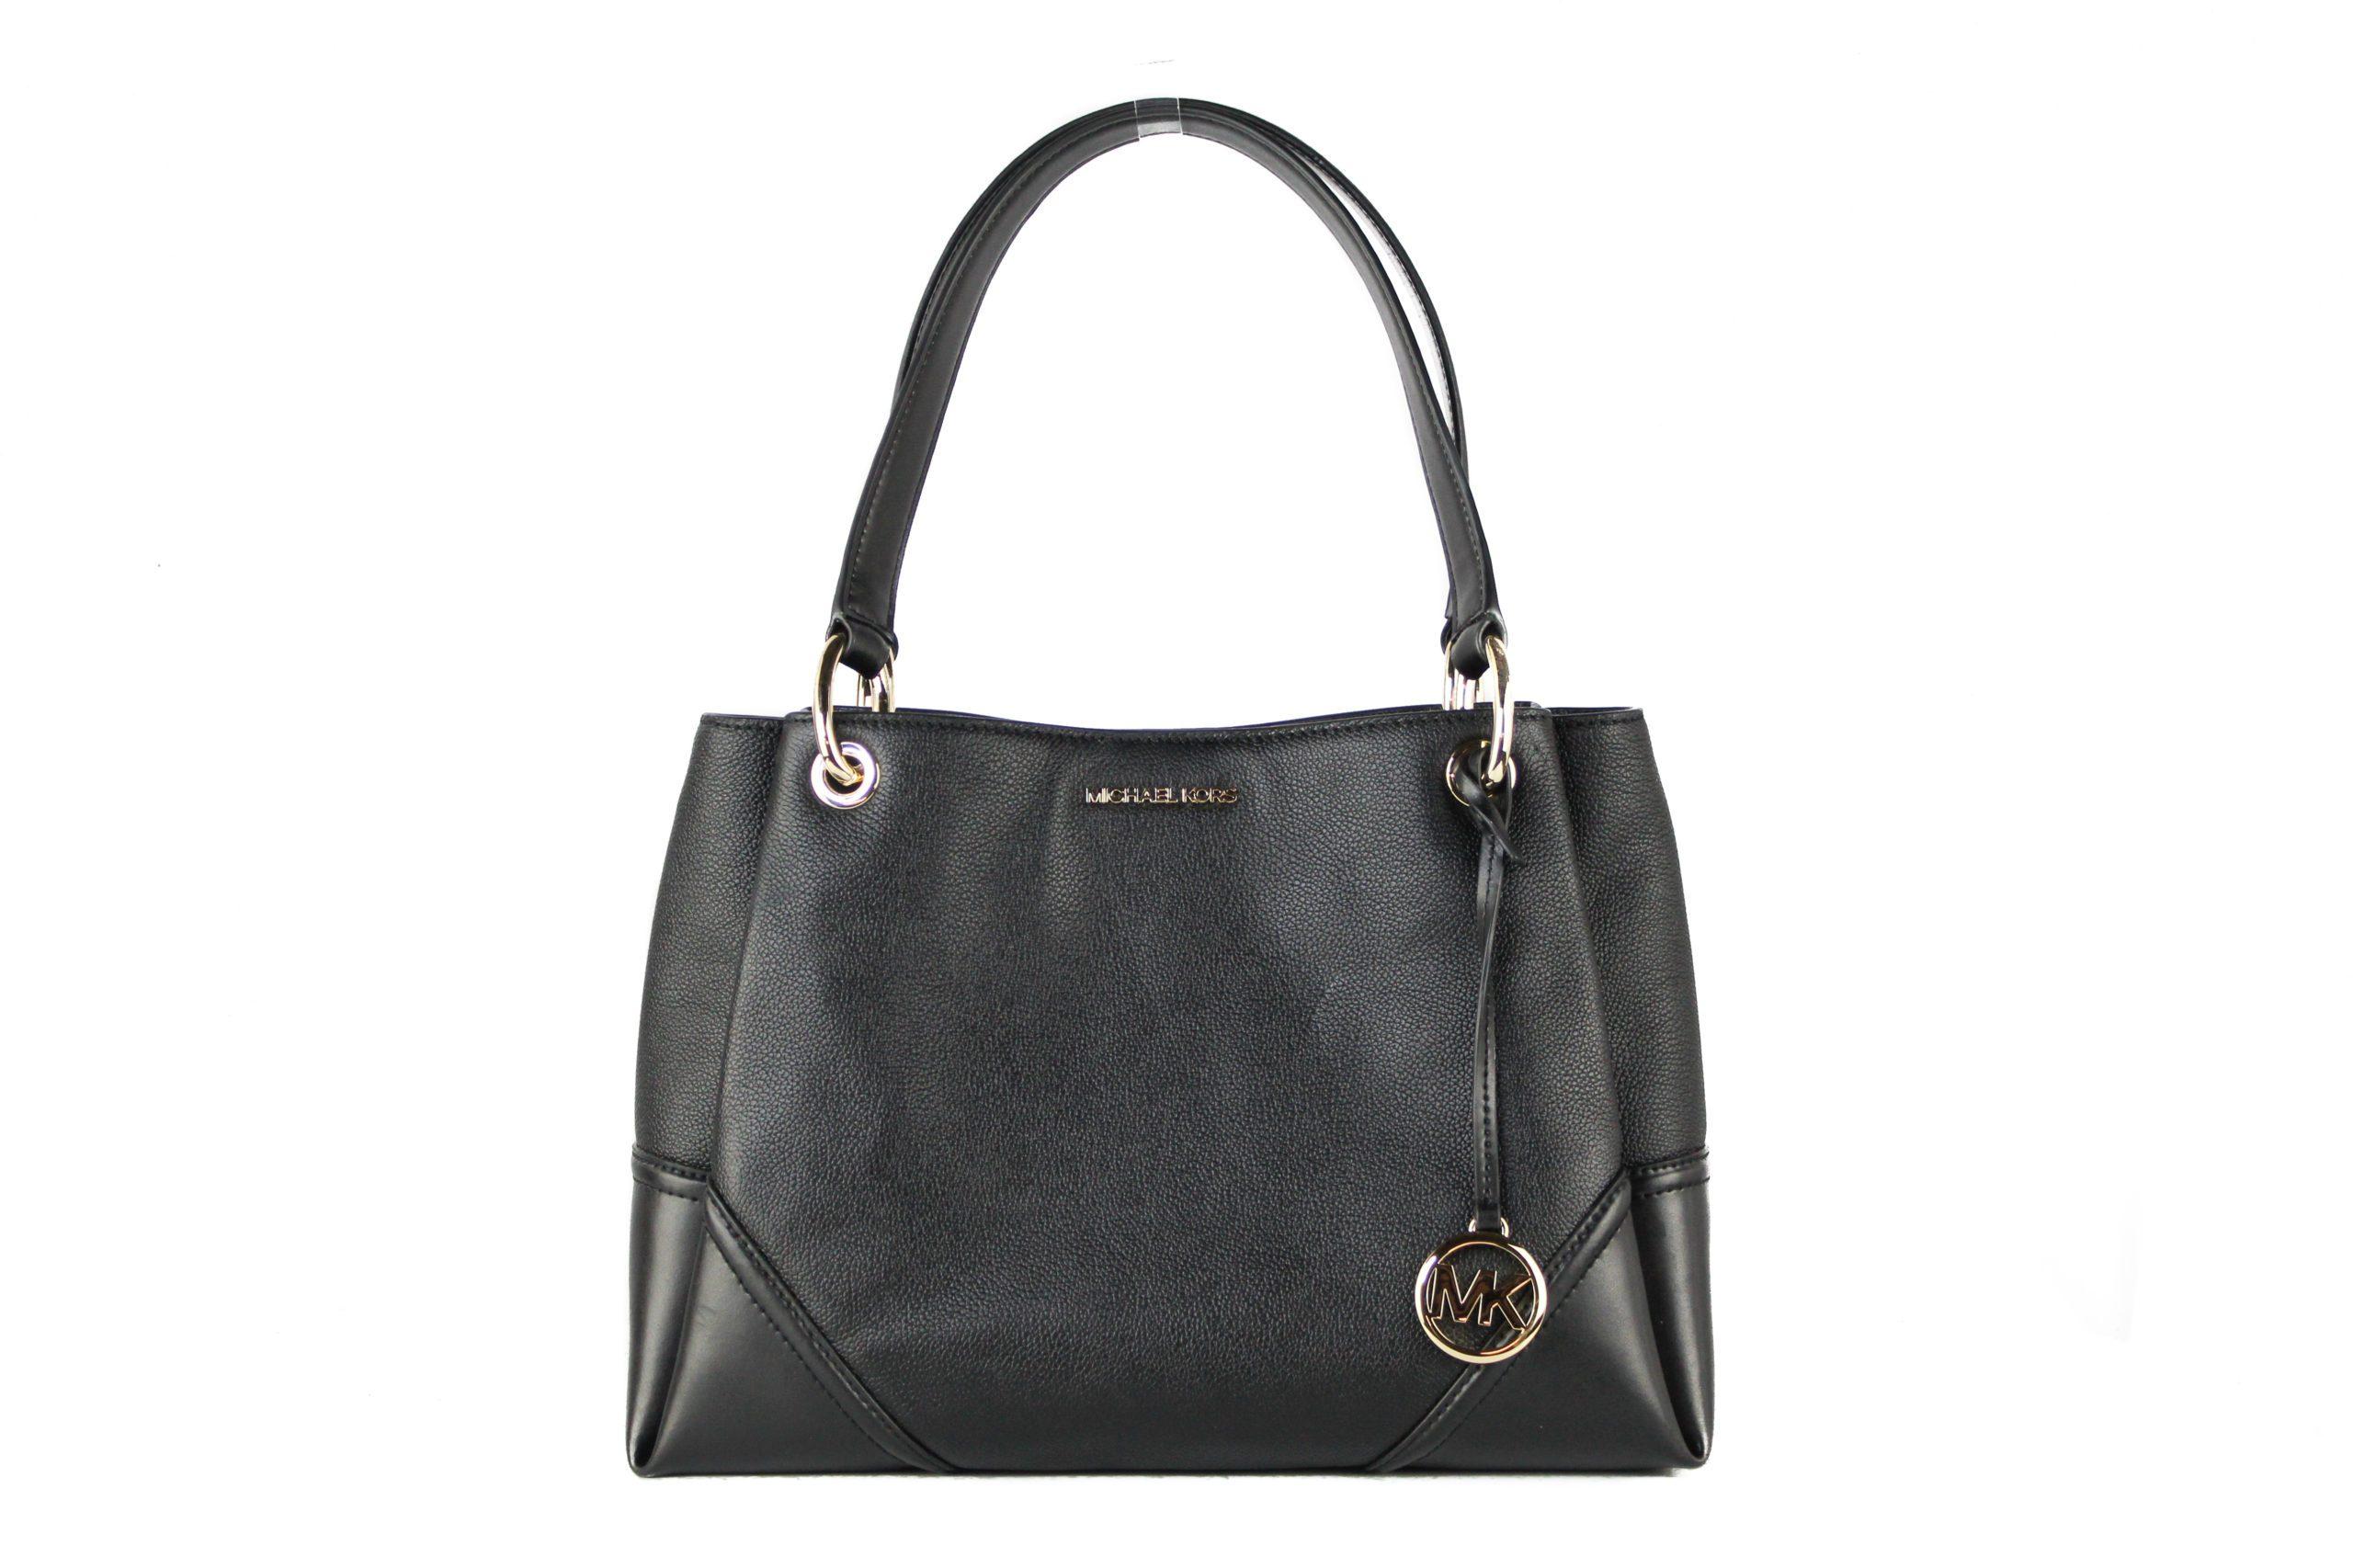 Michael Kors Women's Nicole Shoulder Bag Black 82745